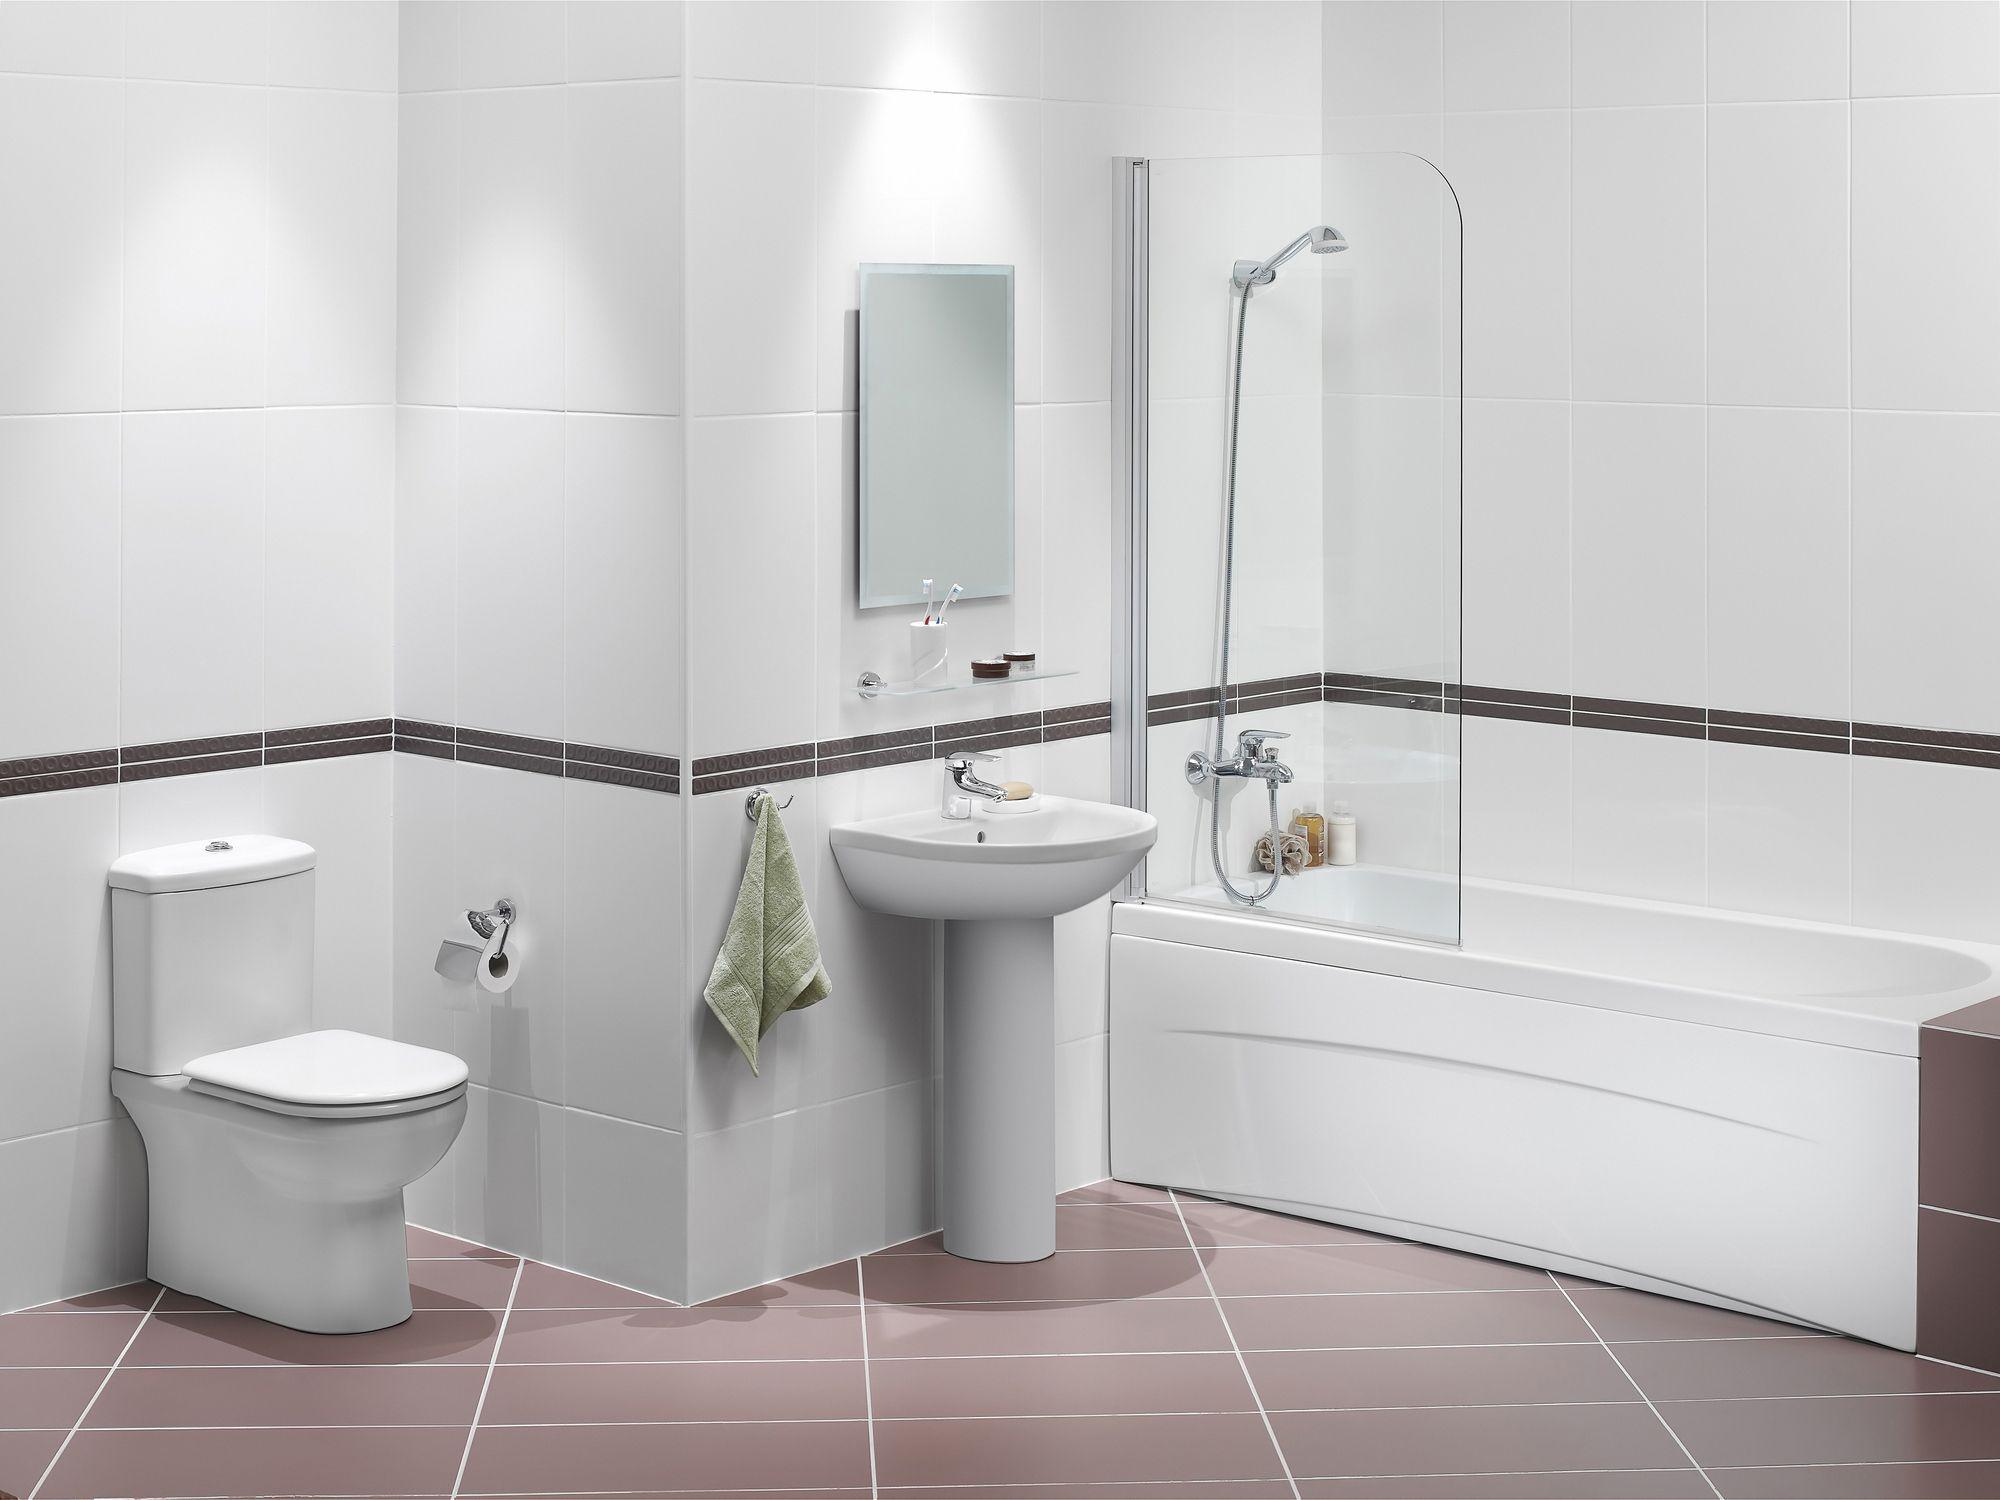 Bathroom floor tiles design ideas - Bathroom Floor Tiles Design Ideas 41